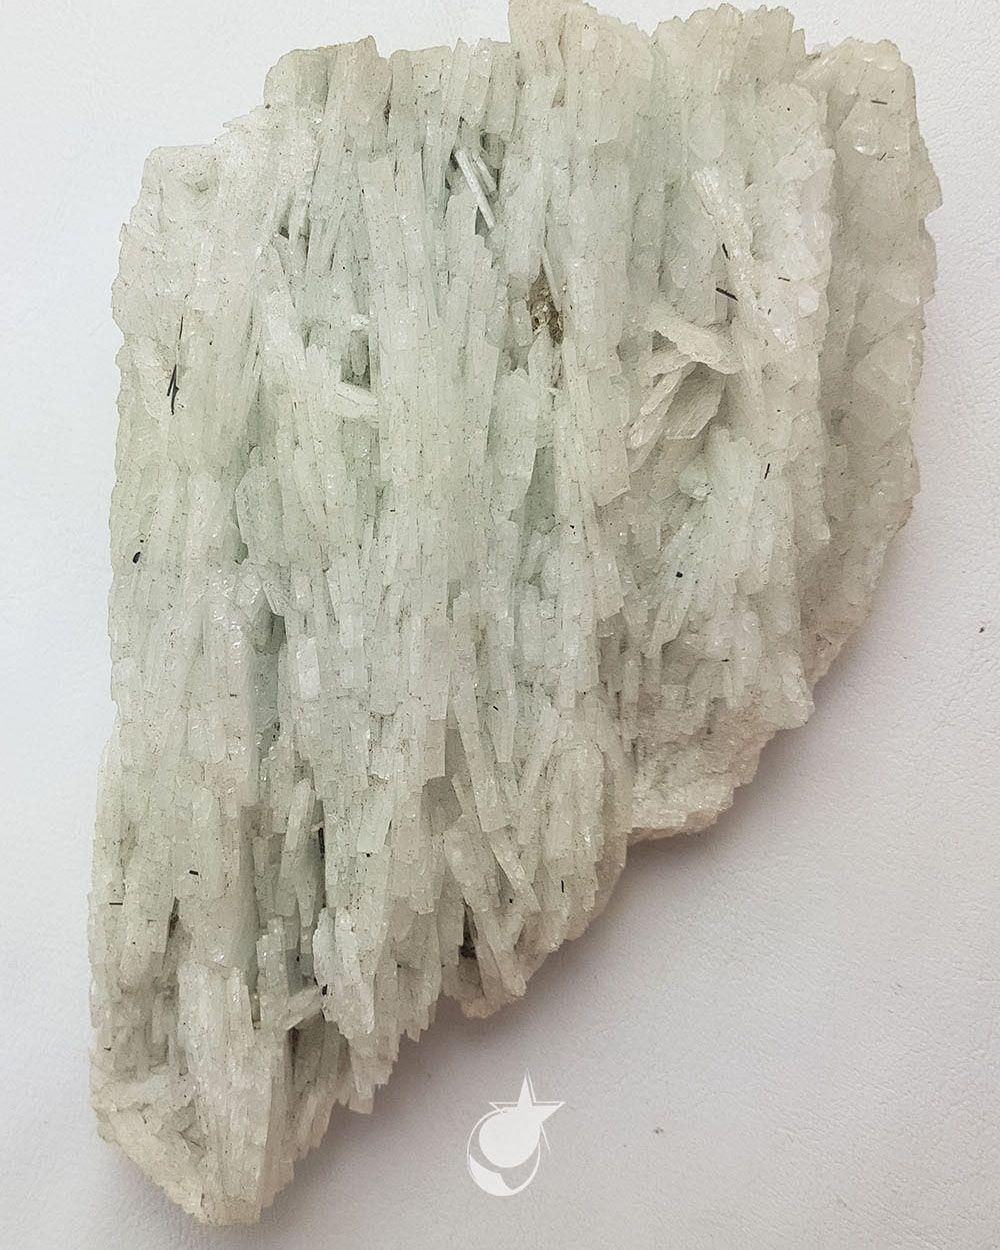 PEDRA DA NEVE/ ALBITA/ FELDSPATO BRANCO/- 12,5 cm